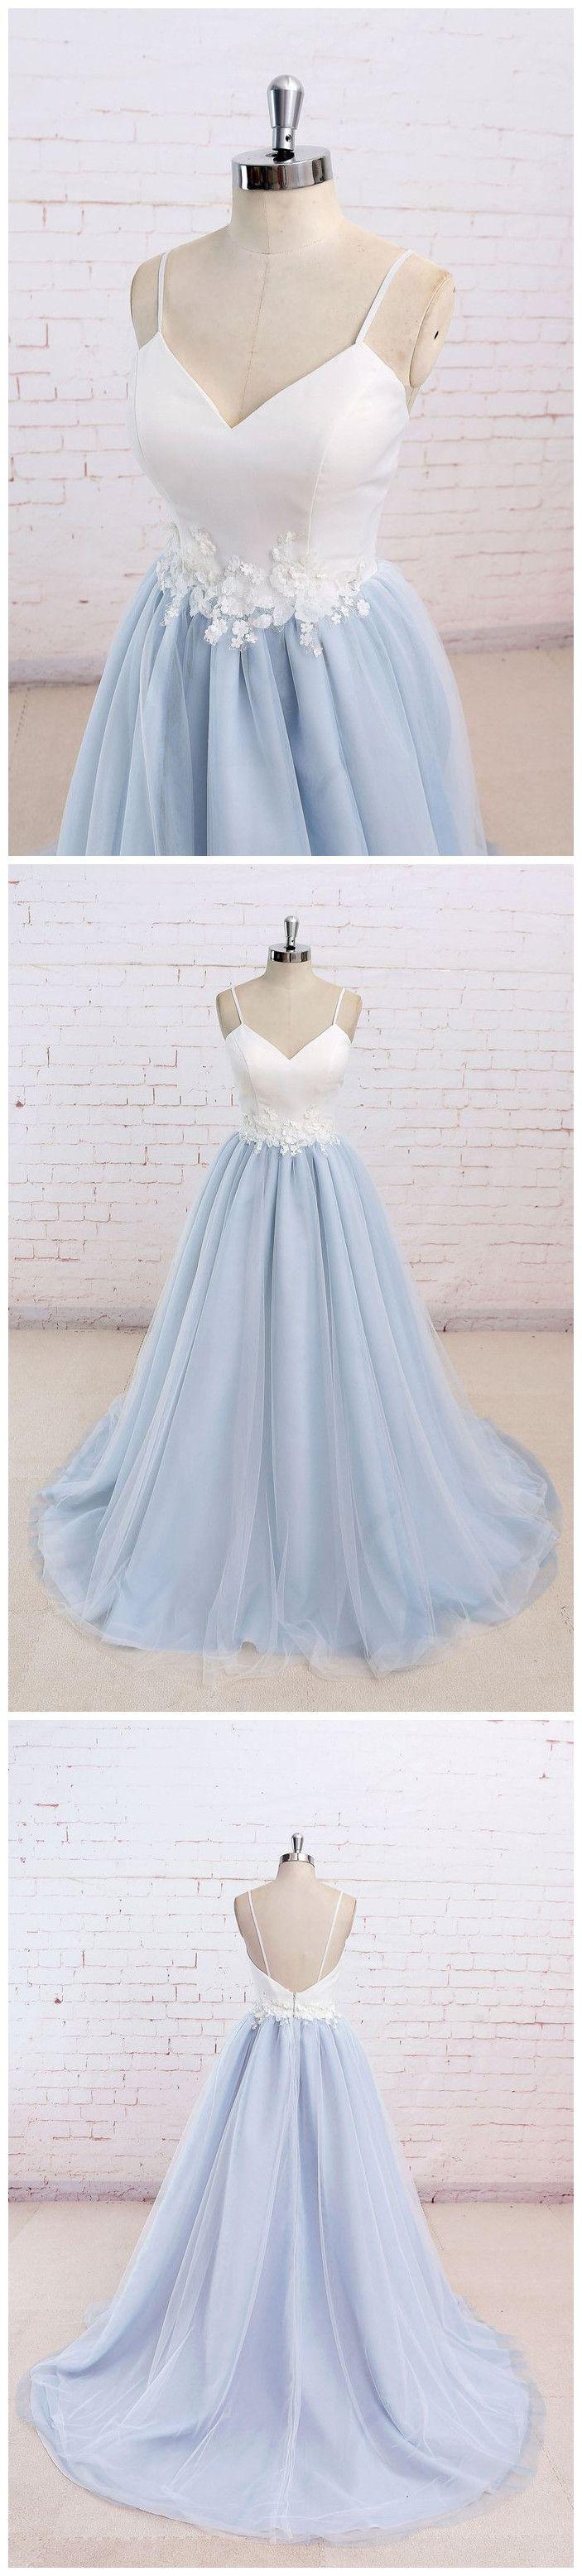 Spaghetti Straps Sweet 16 Party Prom Dress,Long Prom Dresses,Prom Dresses,Evening Dress, Prom Gowns, Formal Women Dress P0634